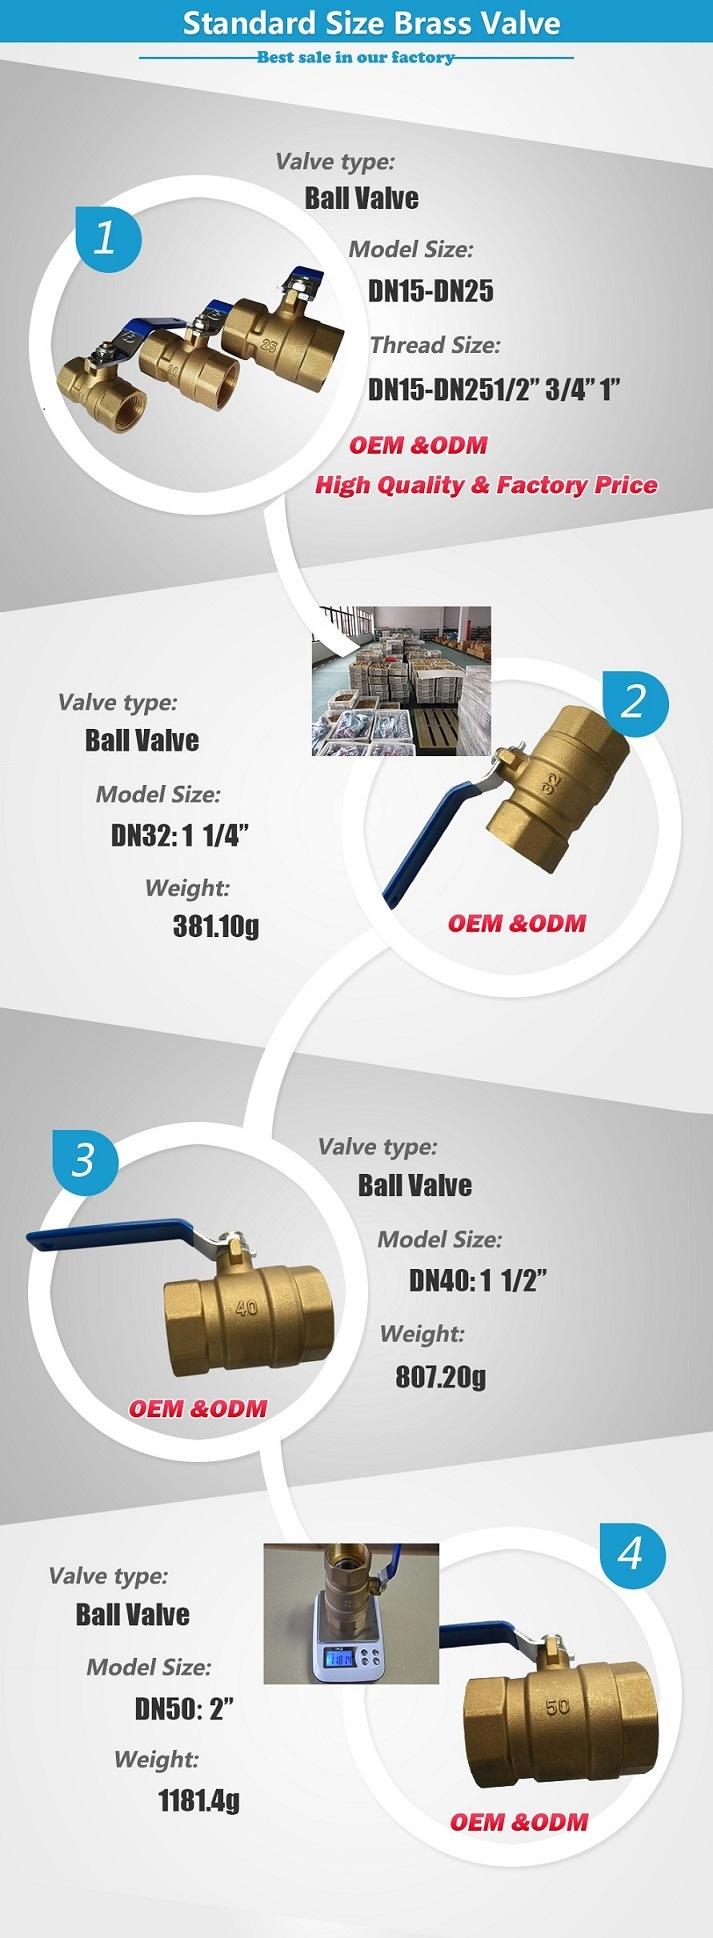 100 Wog Handwheel Brass Stem Ball Valve